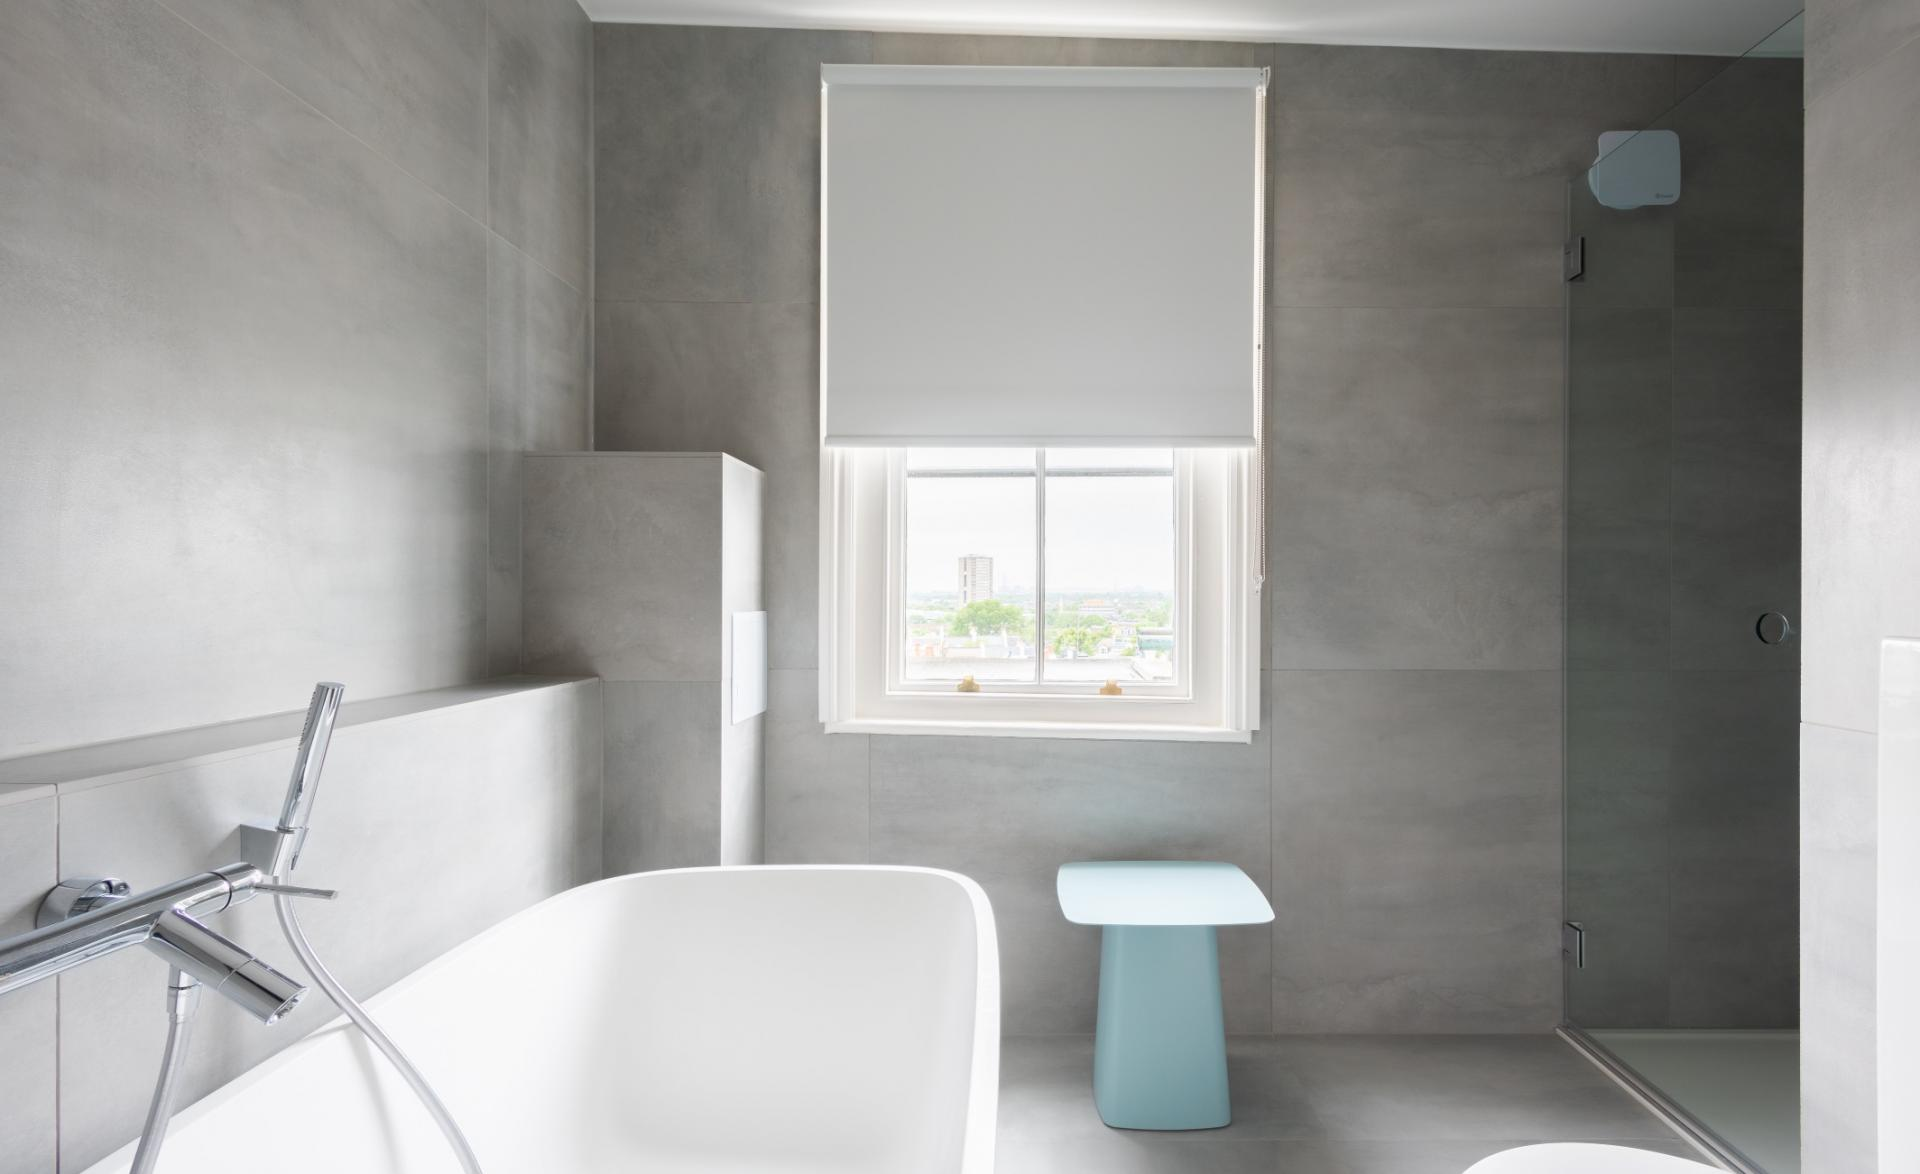 Bath tub at Lansdowne Crescent Apartment, Holland Park, London